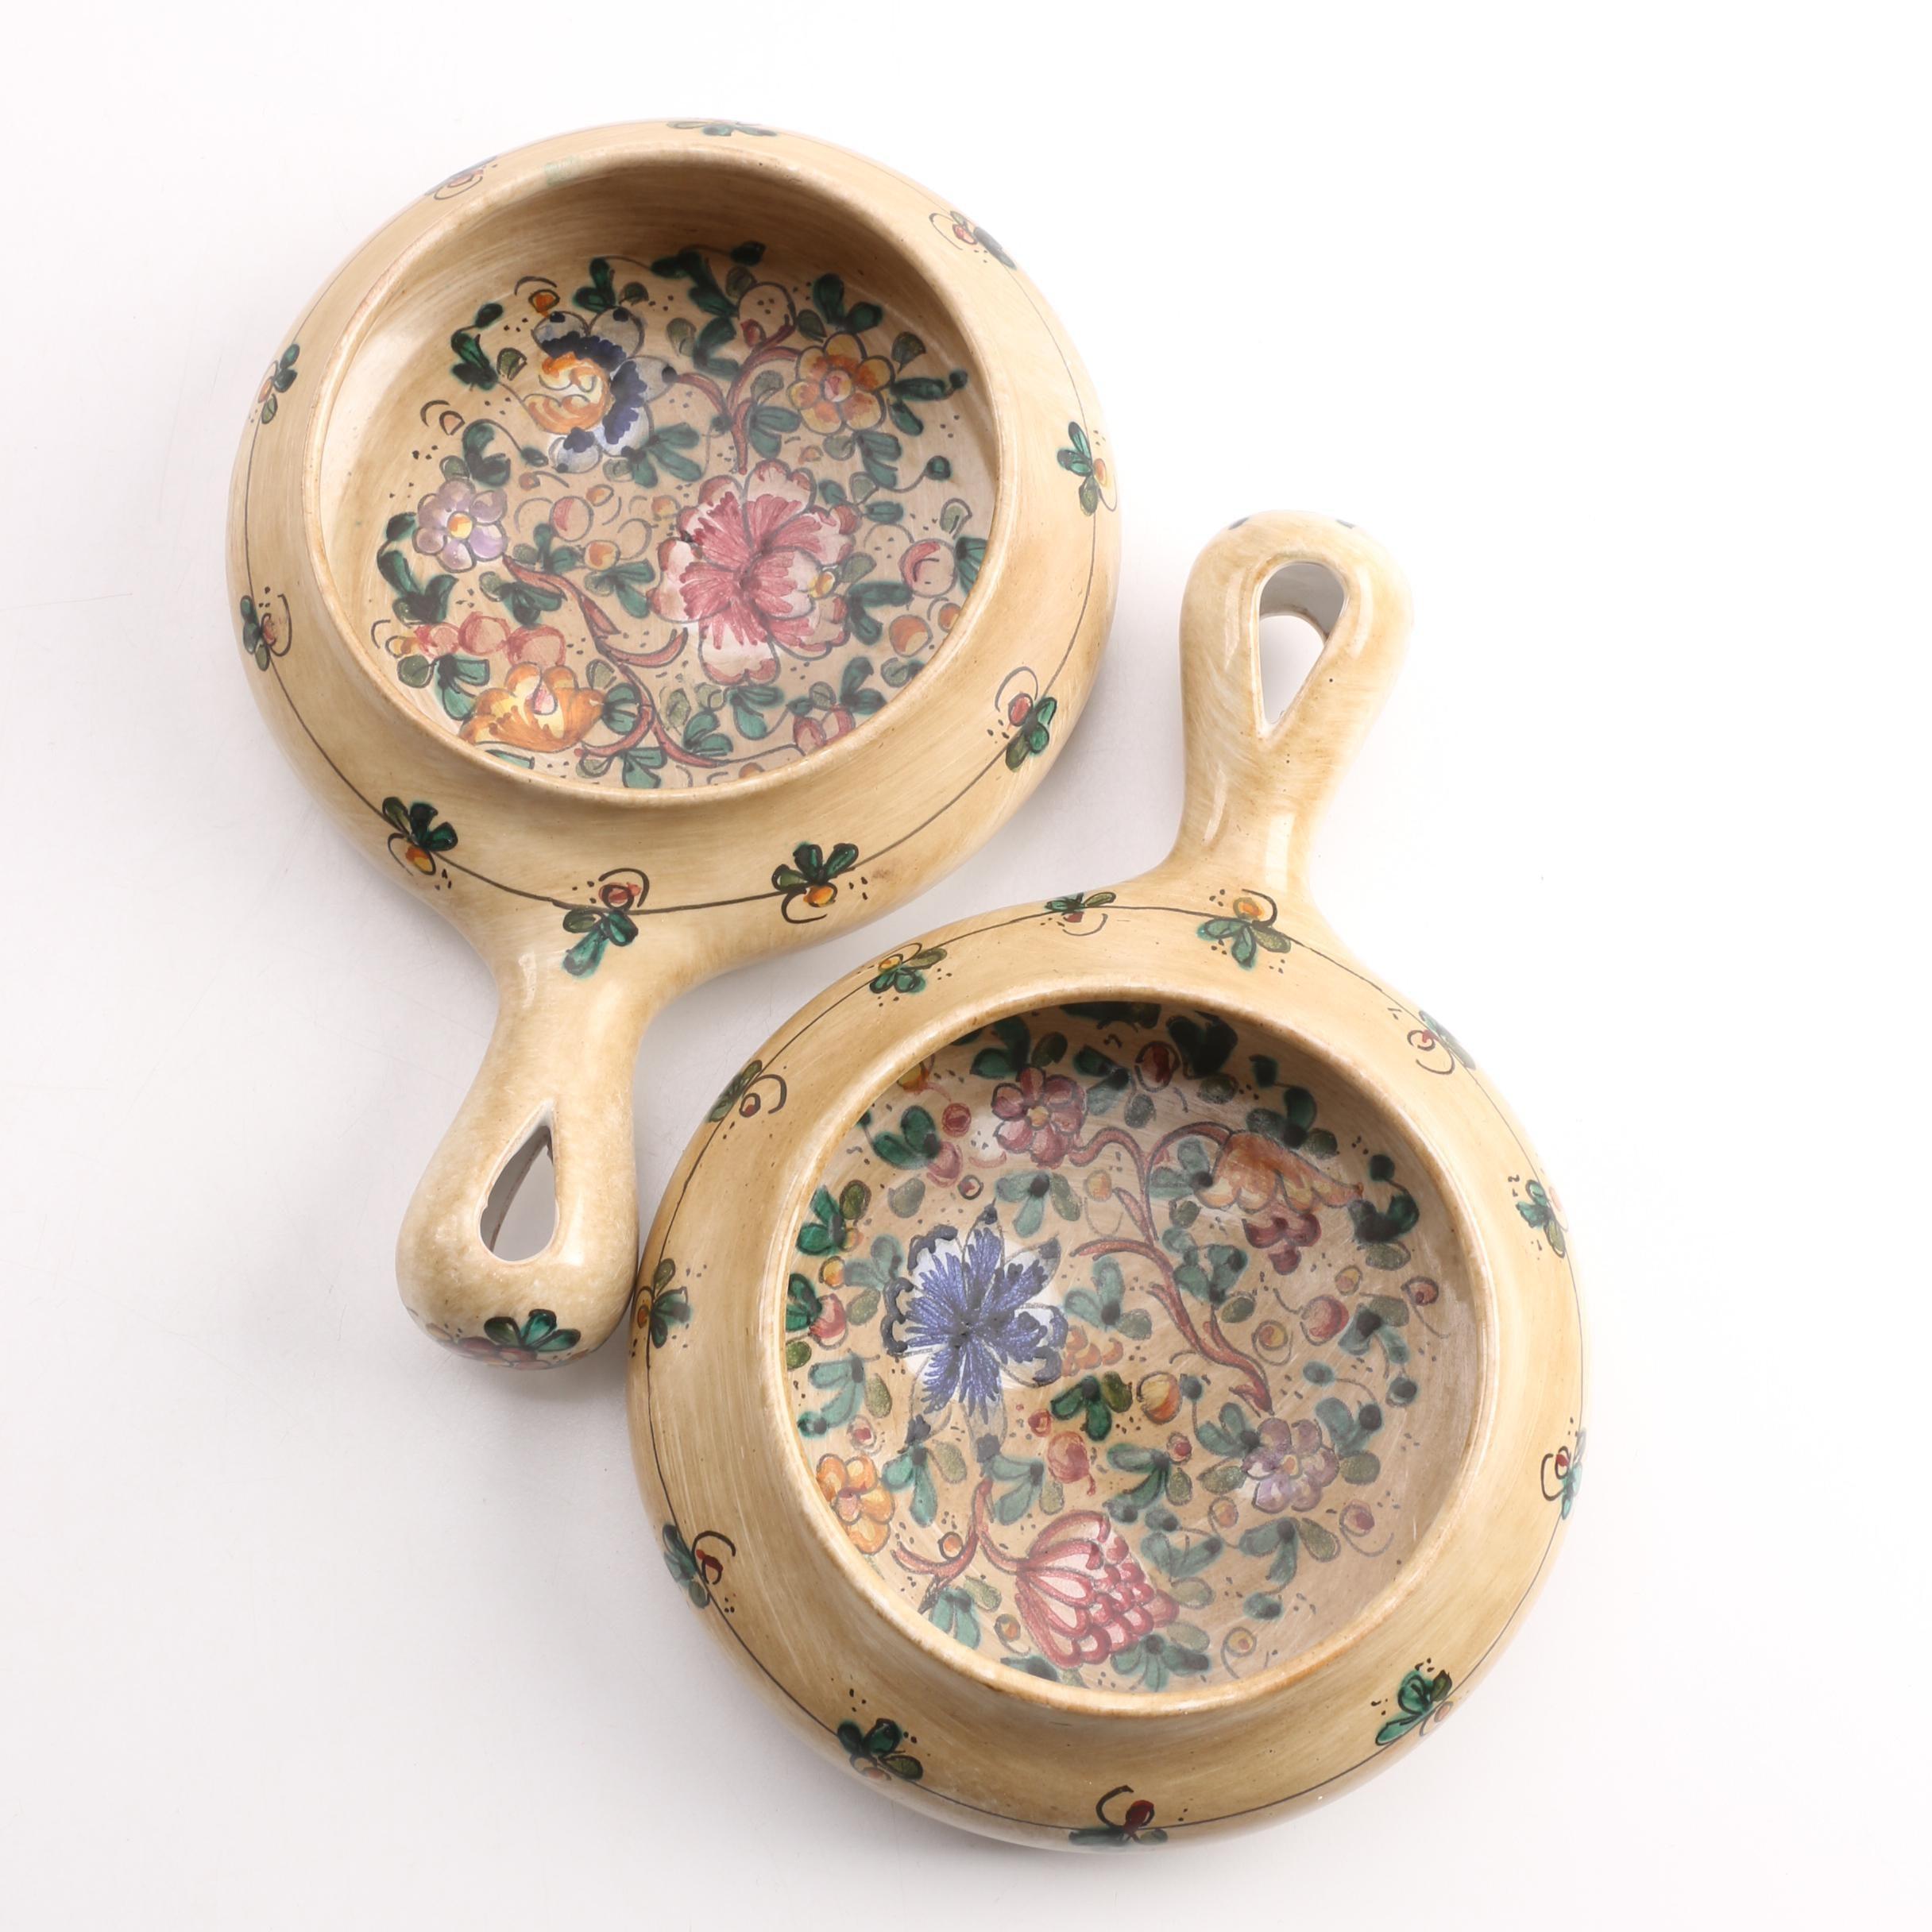 Hand-Painted Italian Ceramic Pipkins